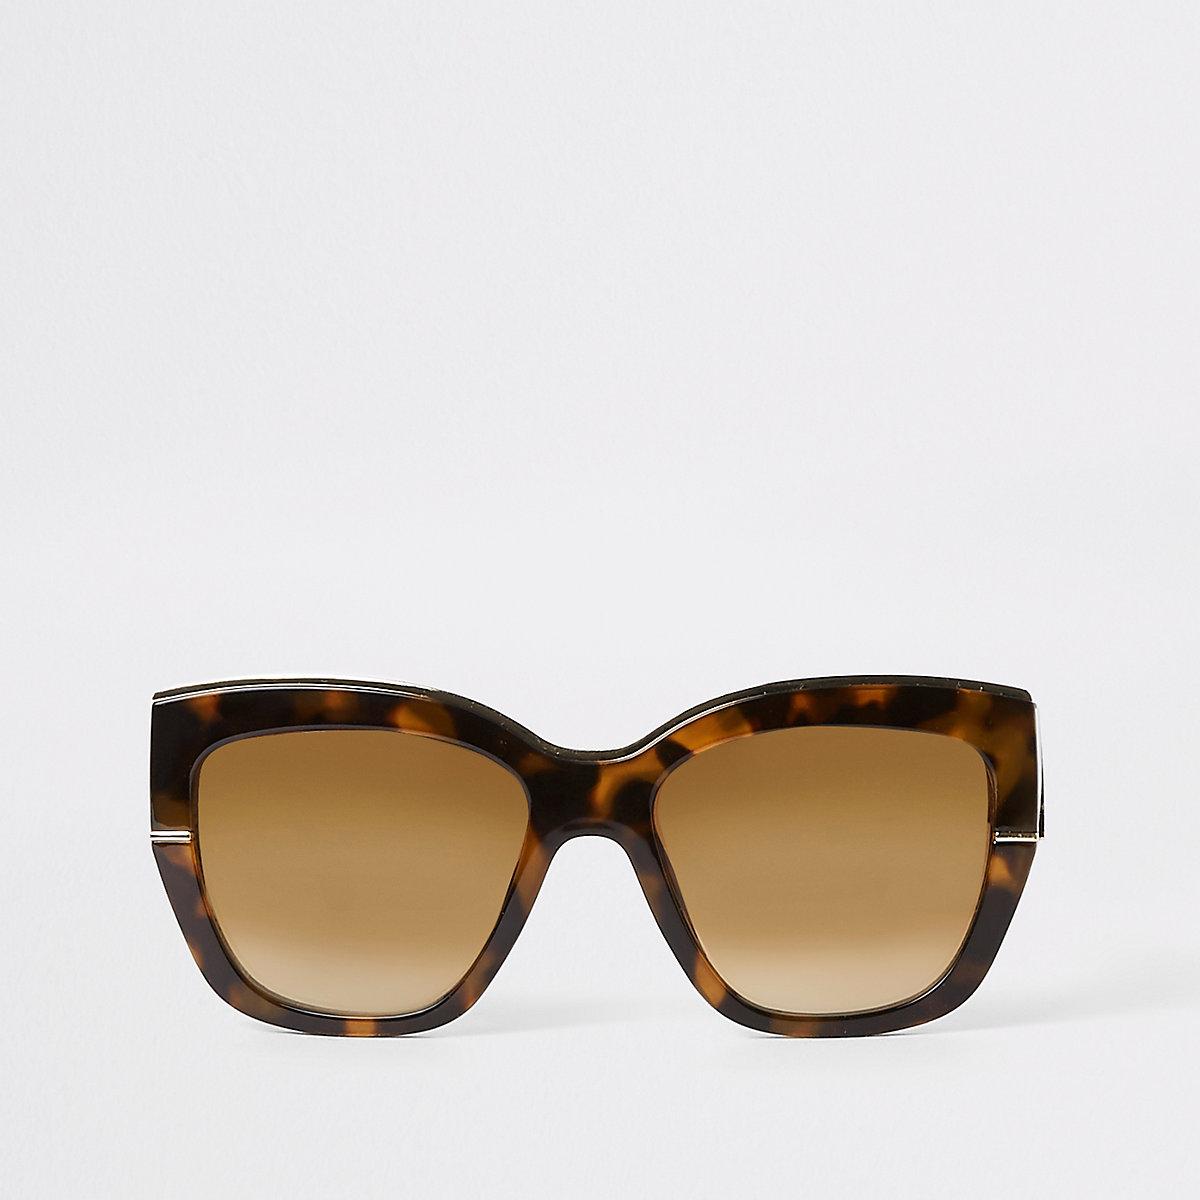 Brown tortoiseshell gold tone glam sunglasses